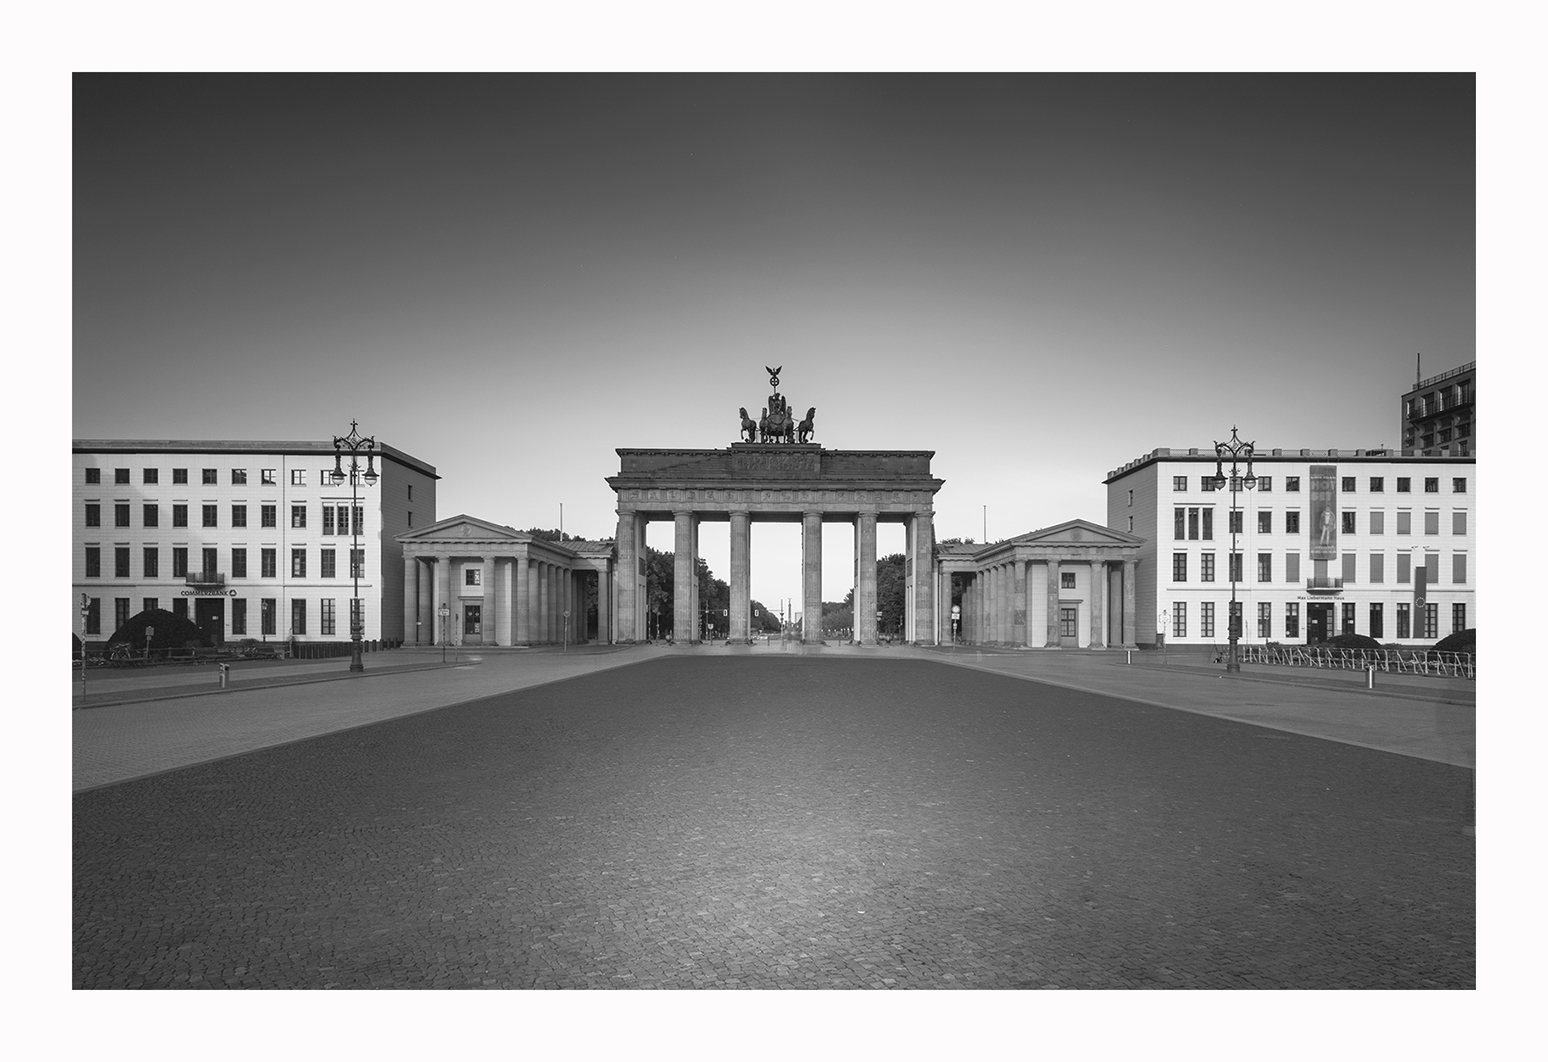 Brandenburger Gate / Tor, Germany